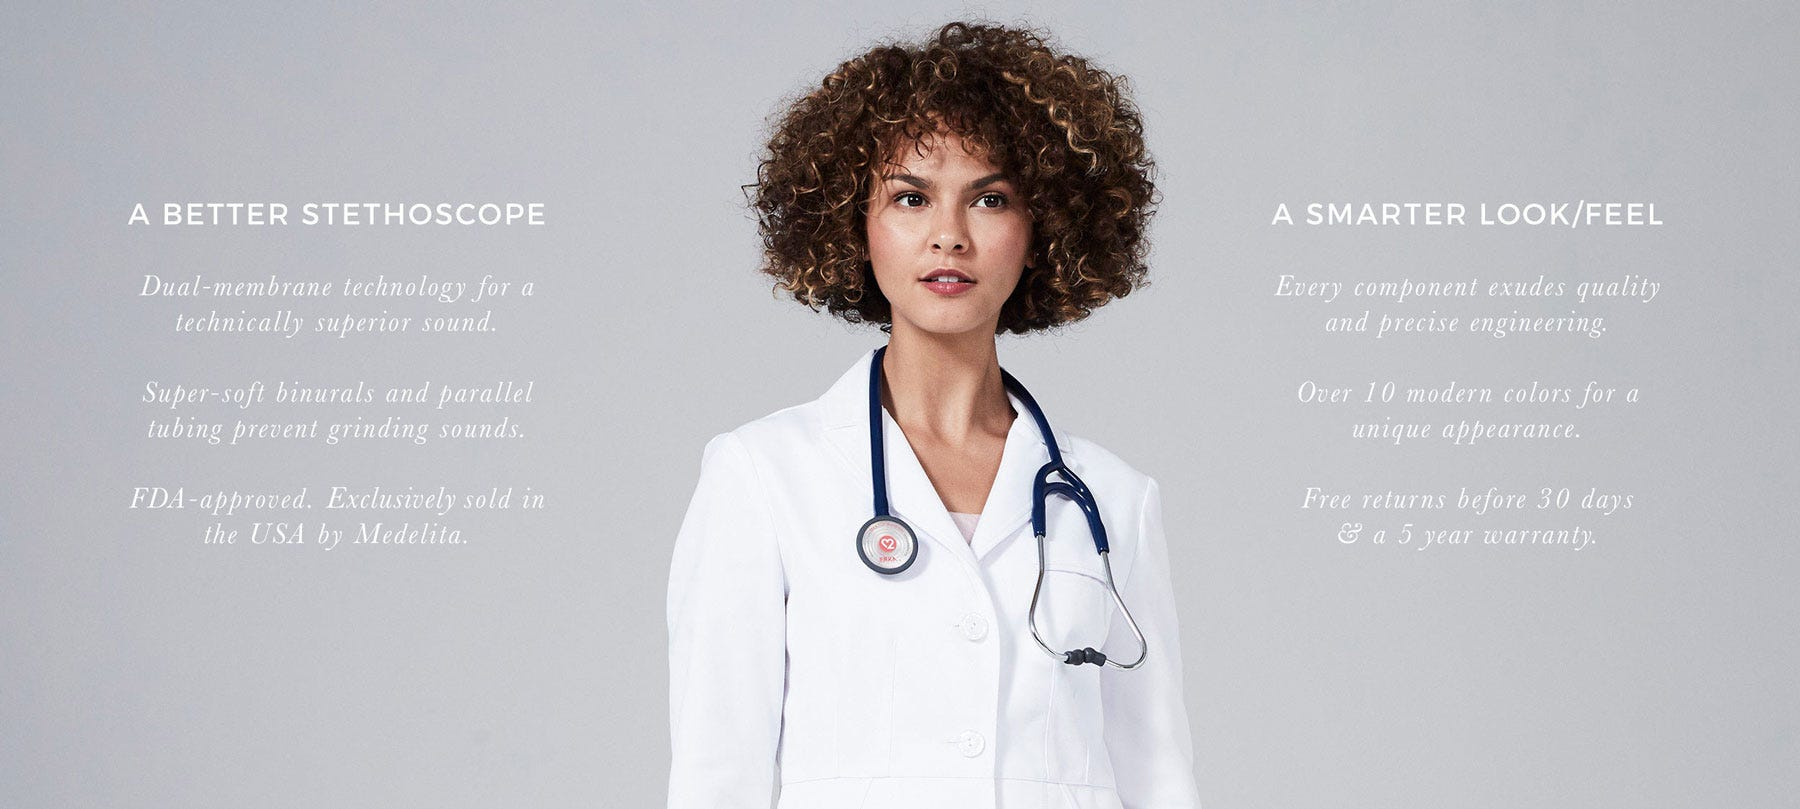 stethoscopes information